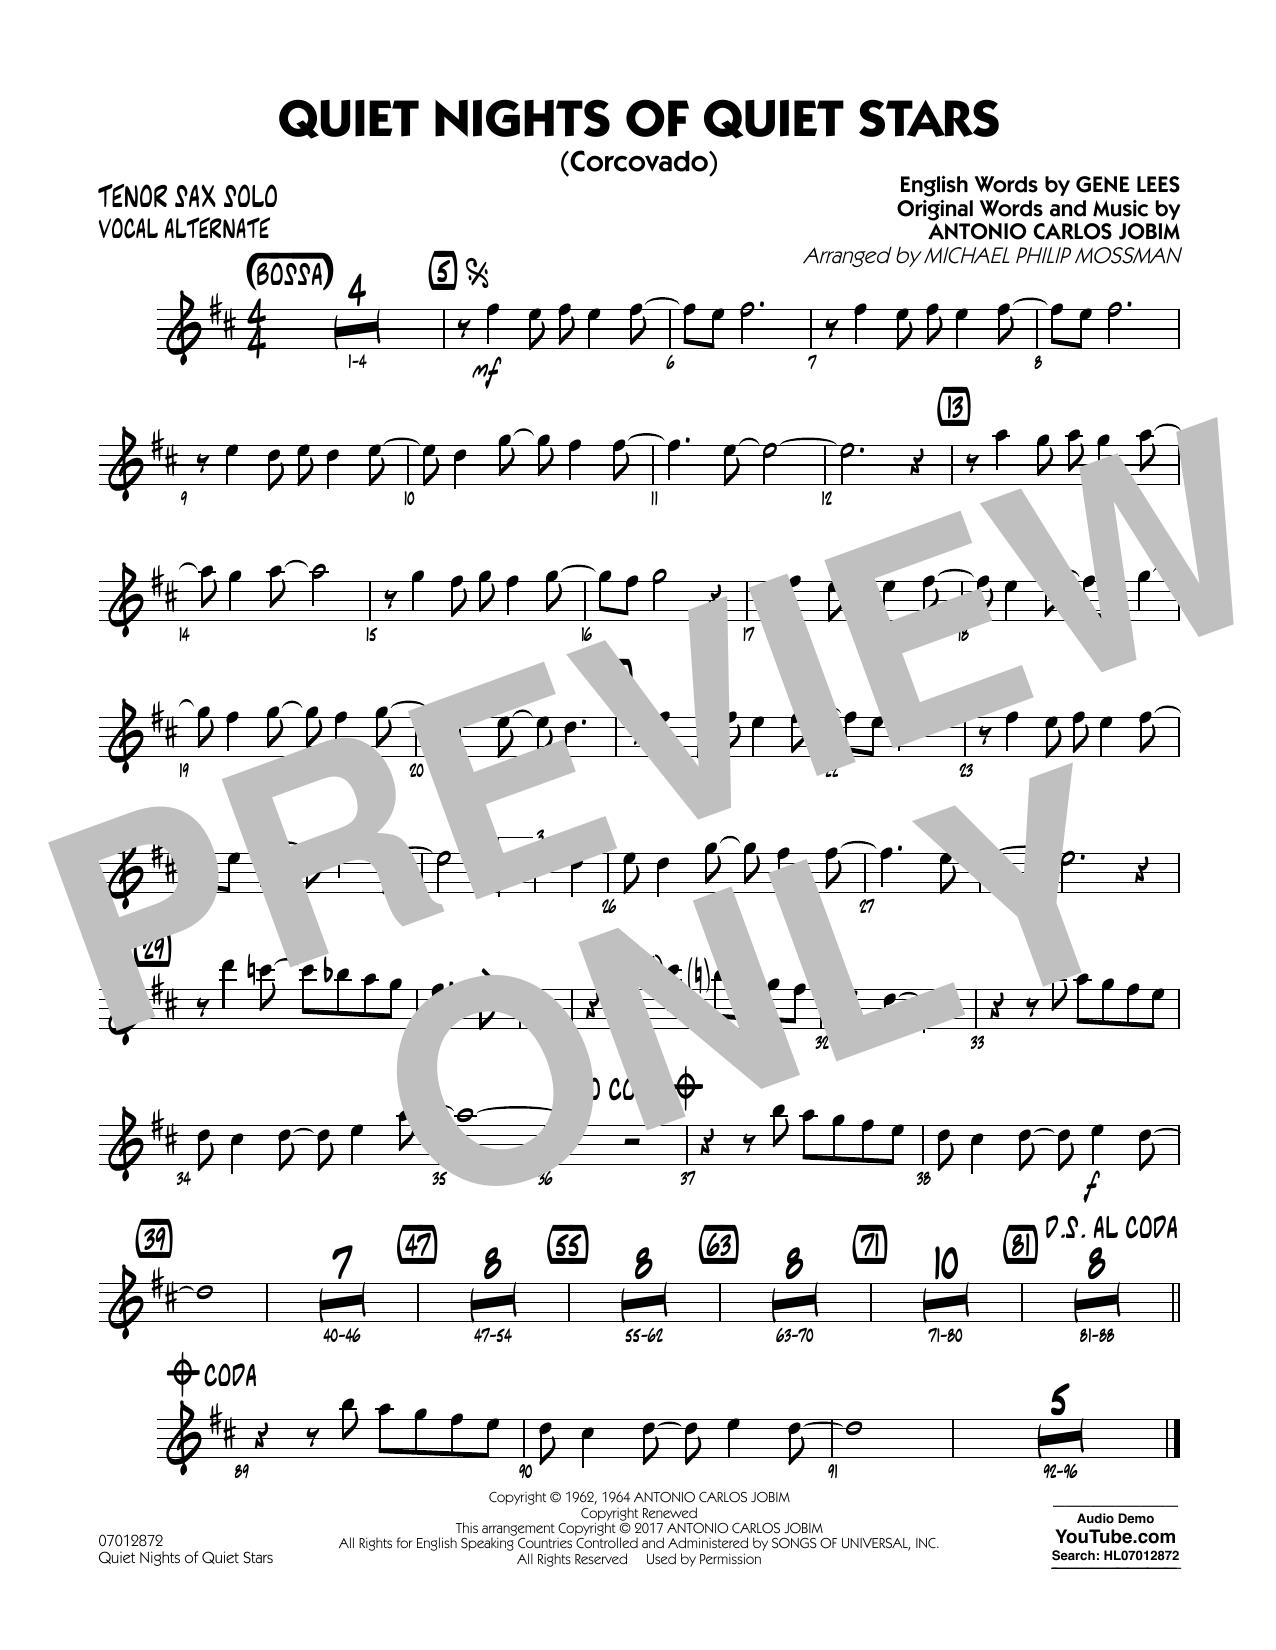 Quiet Nights of Quiet Stars (Corcovado) - Tenor Sax Solo (Vocal Alt) Sheet Music